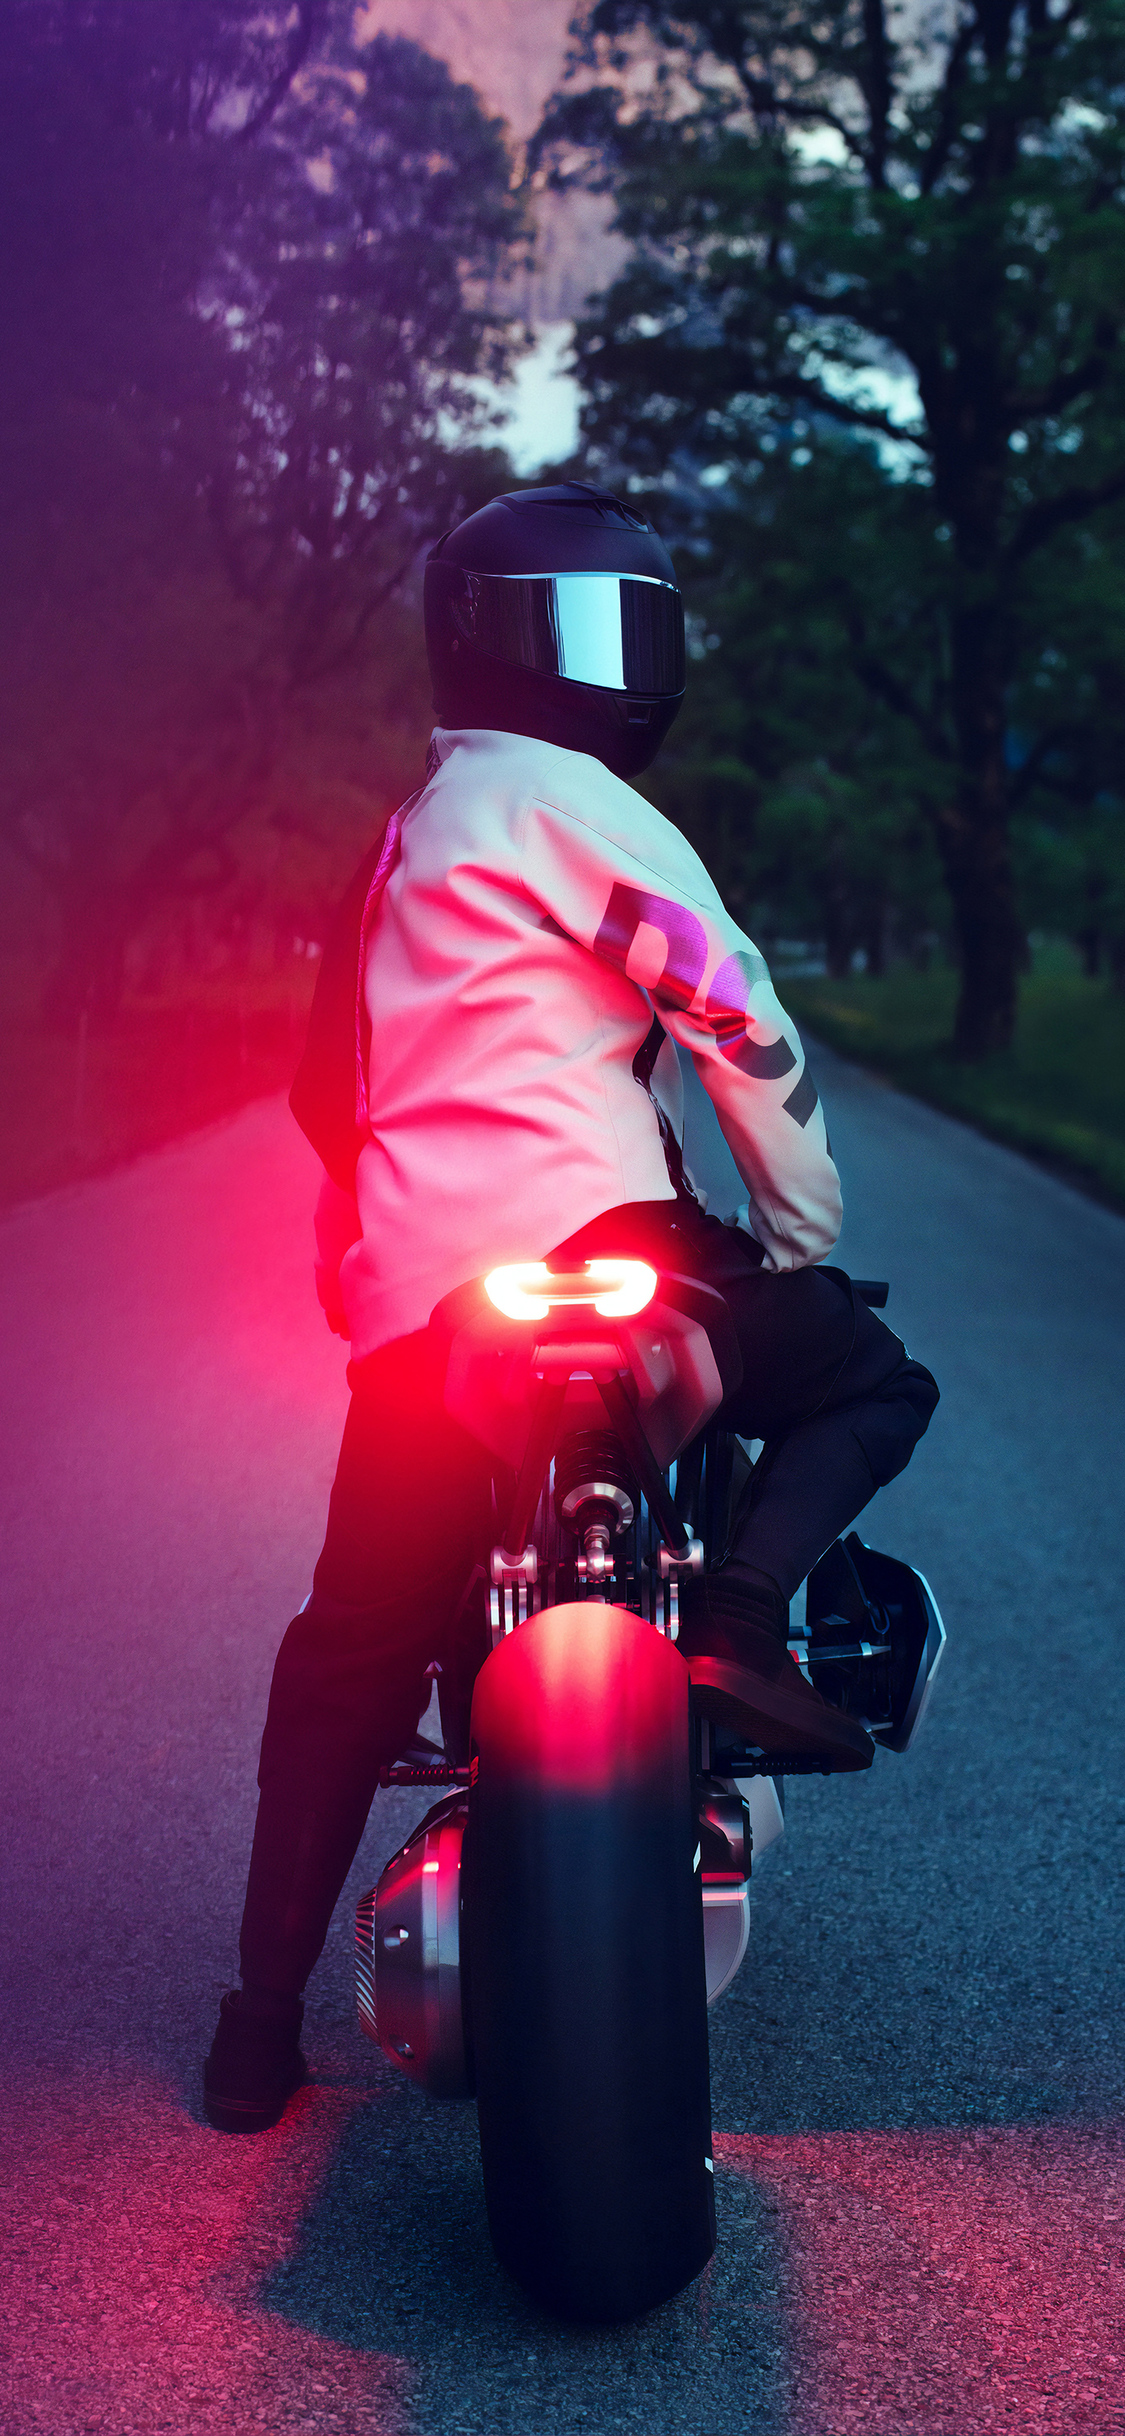 bmw-vision-dc-roadster-rider-5p.jpg